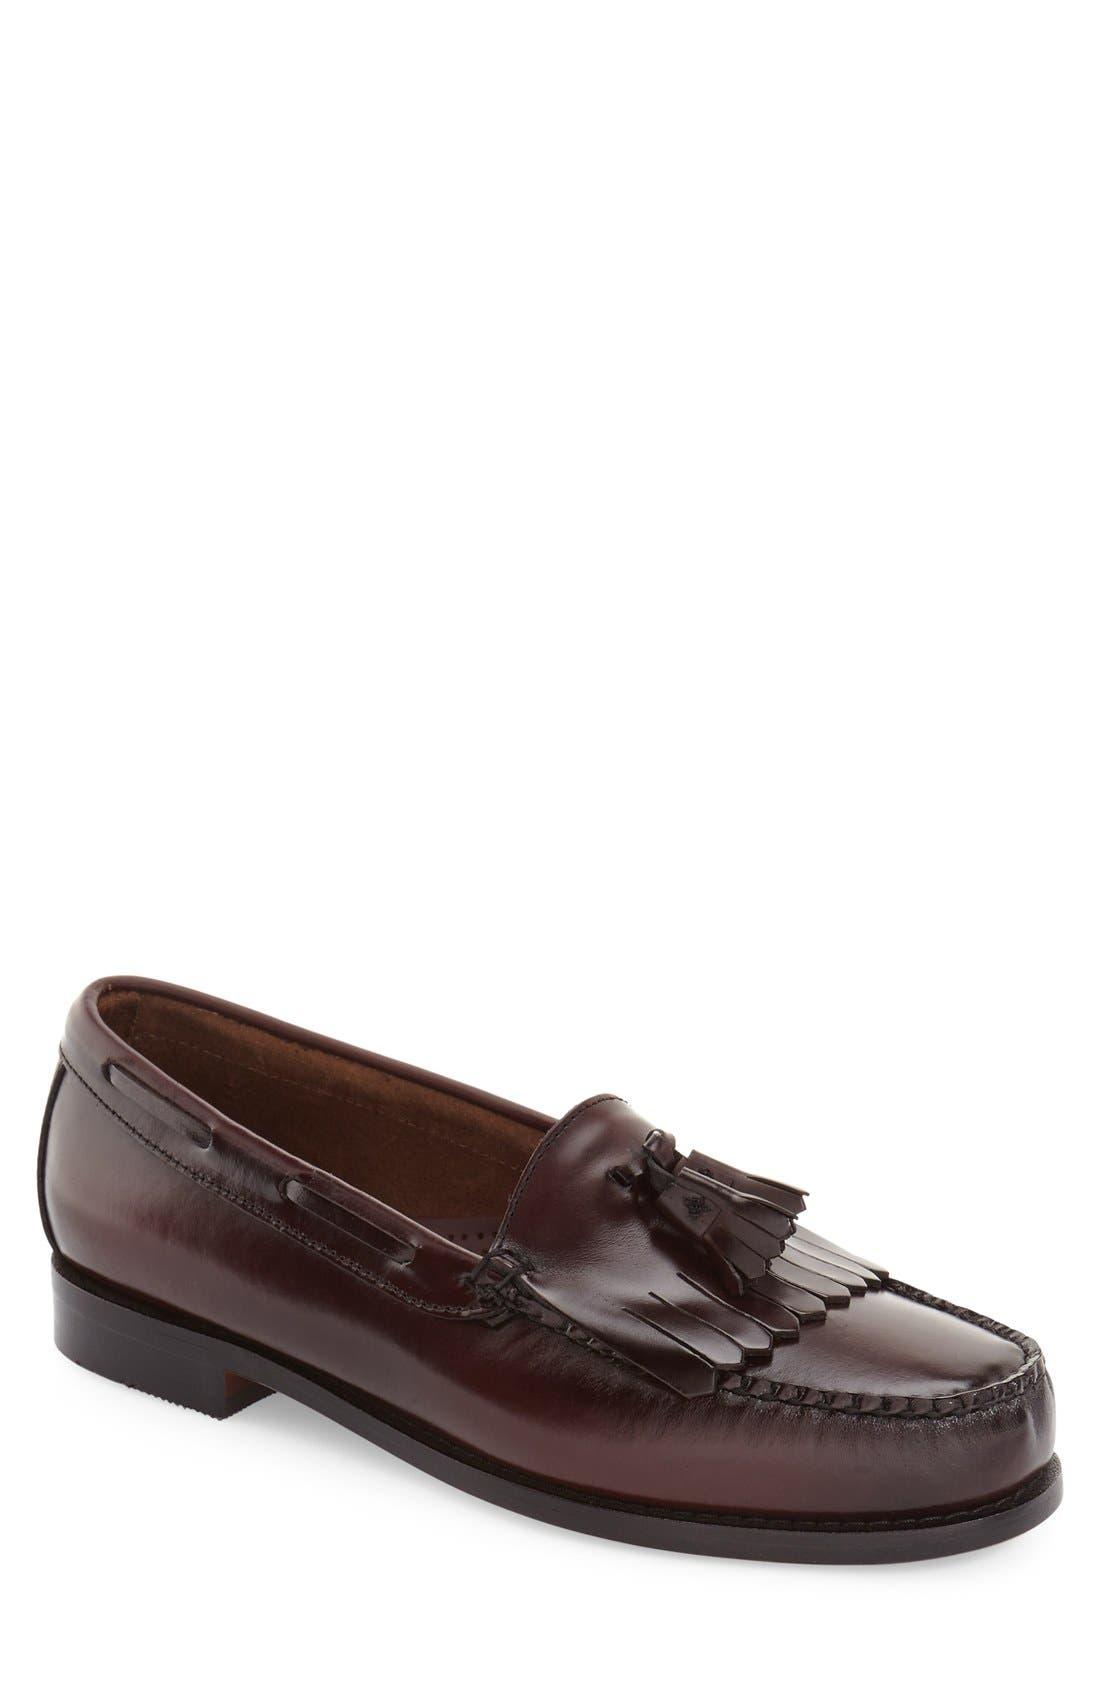 G.H. BASS & CO. 'Layton' Tassel Loafer, Main, color, BURGUNDY